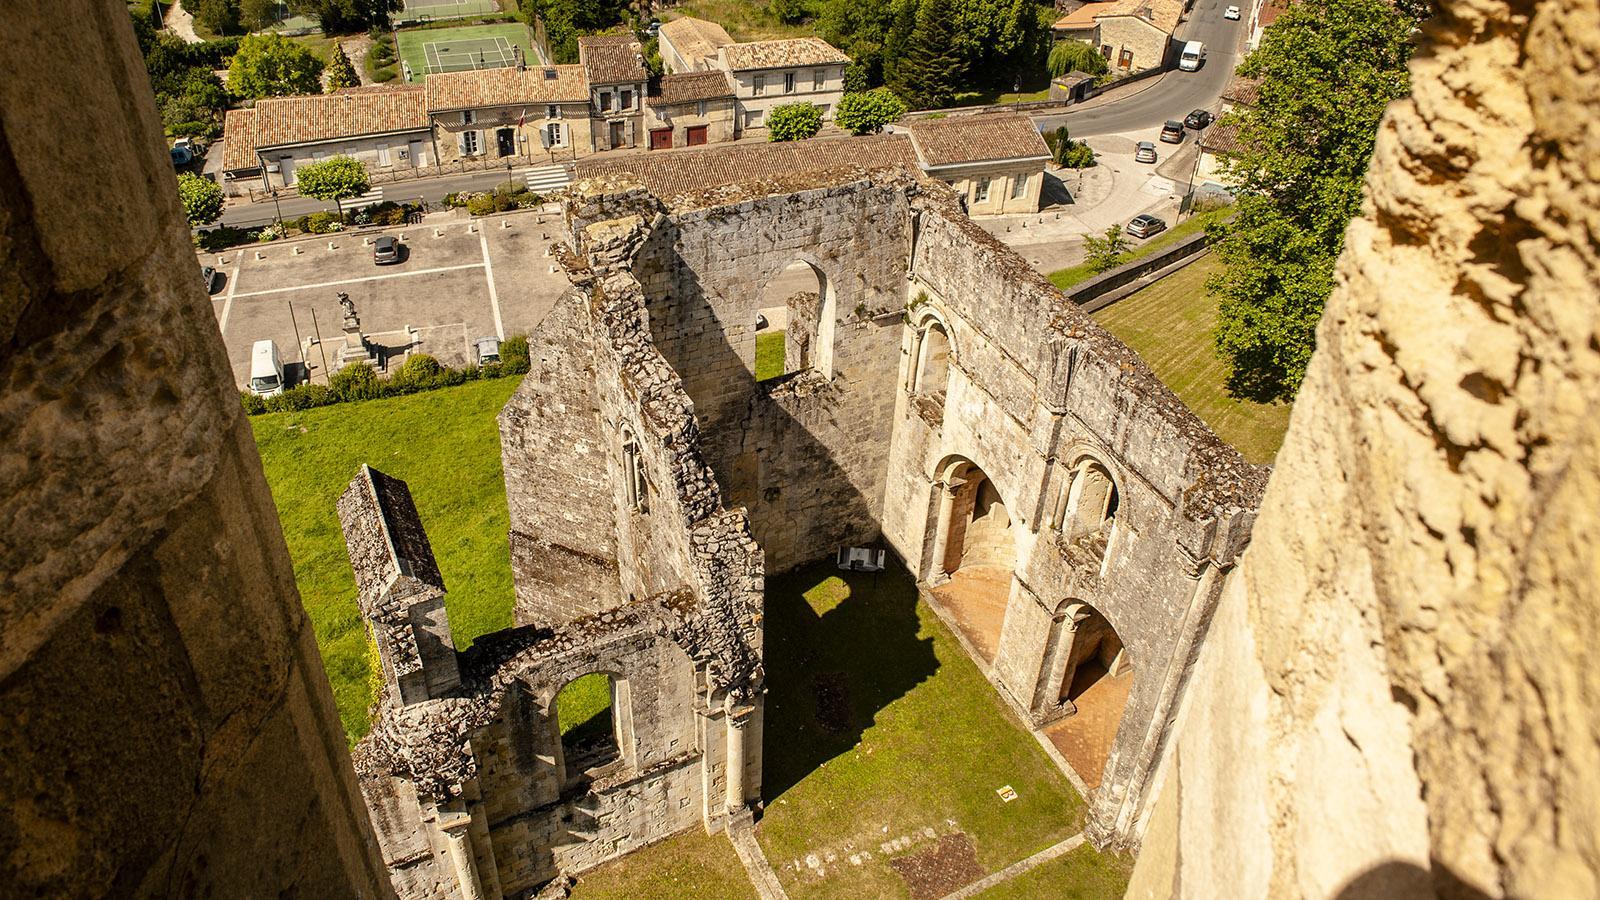 Entre-deux-Mers: Der Glockenturm der Abbaye de la Sauve-Majeure eröffnet weite Ausblicke. Foto: Hilke Maunder